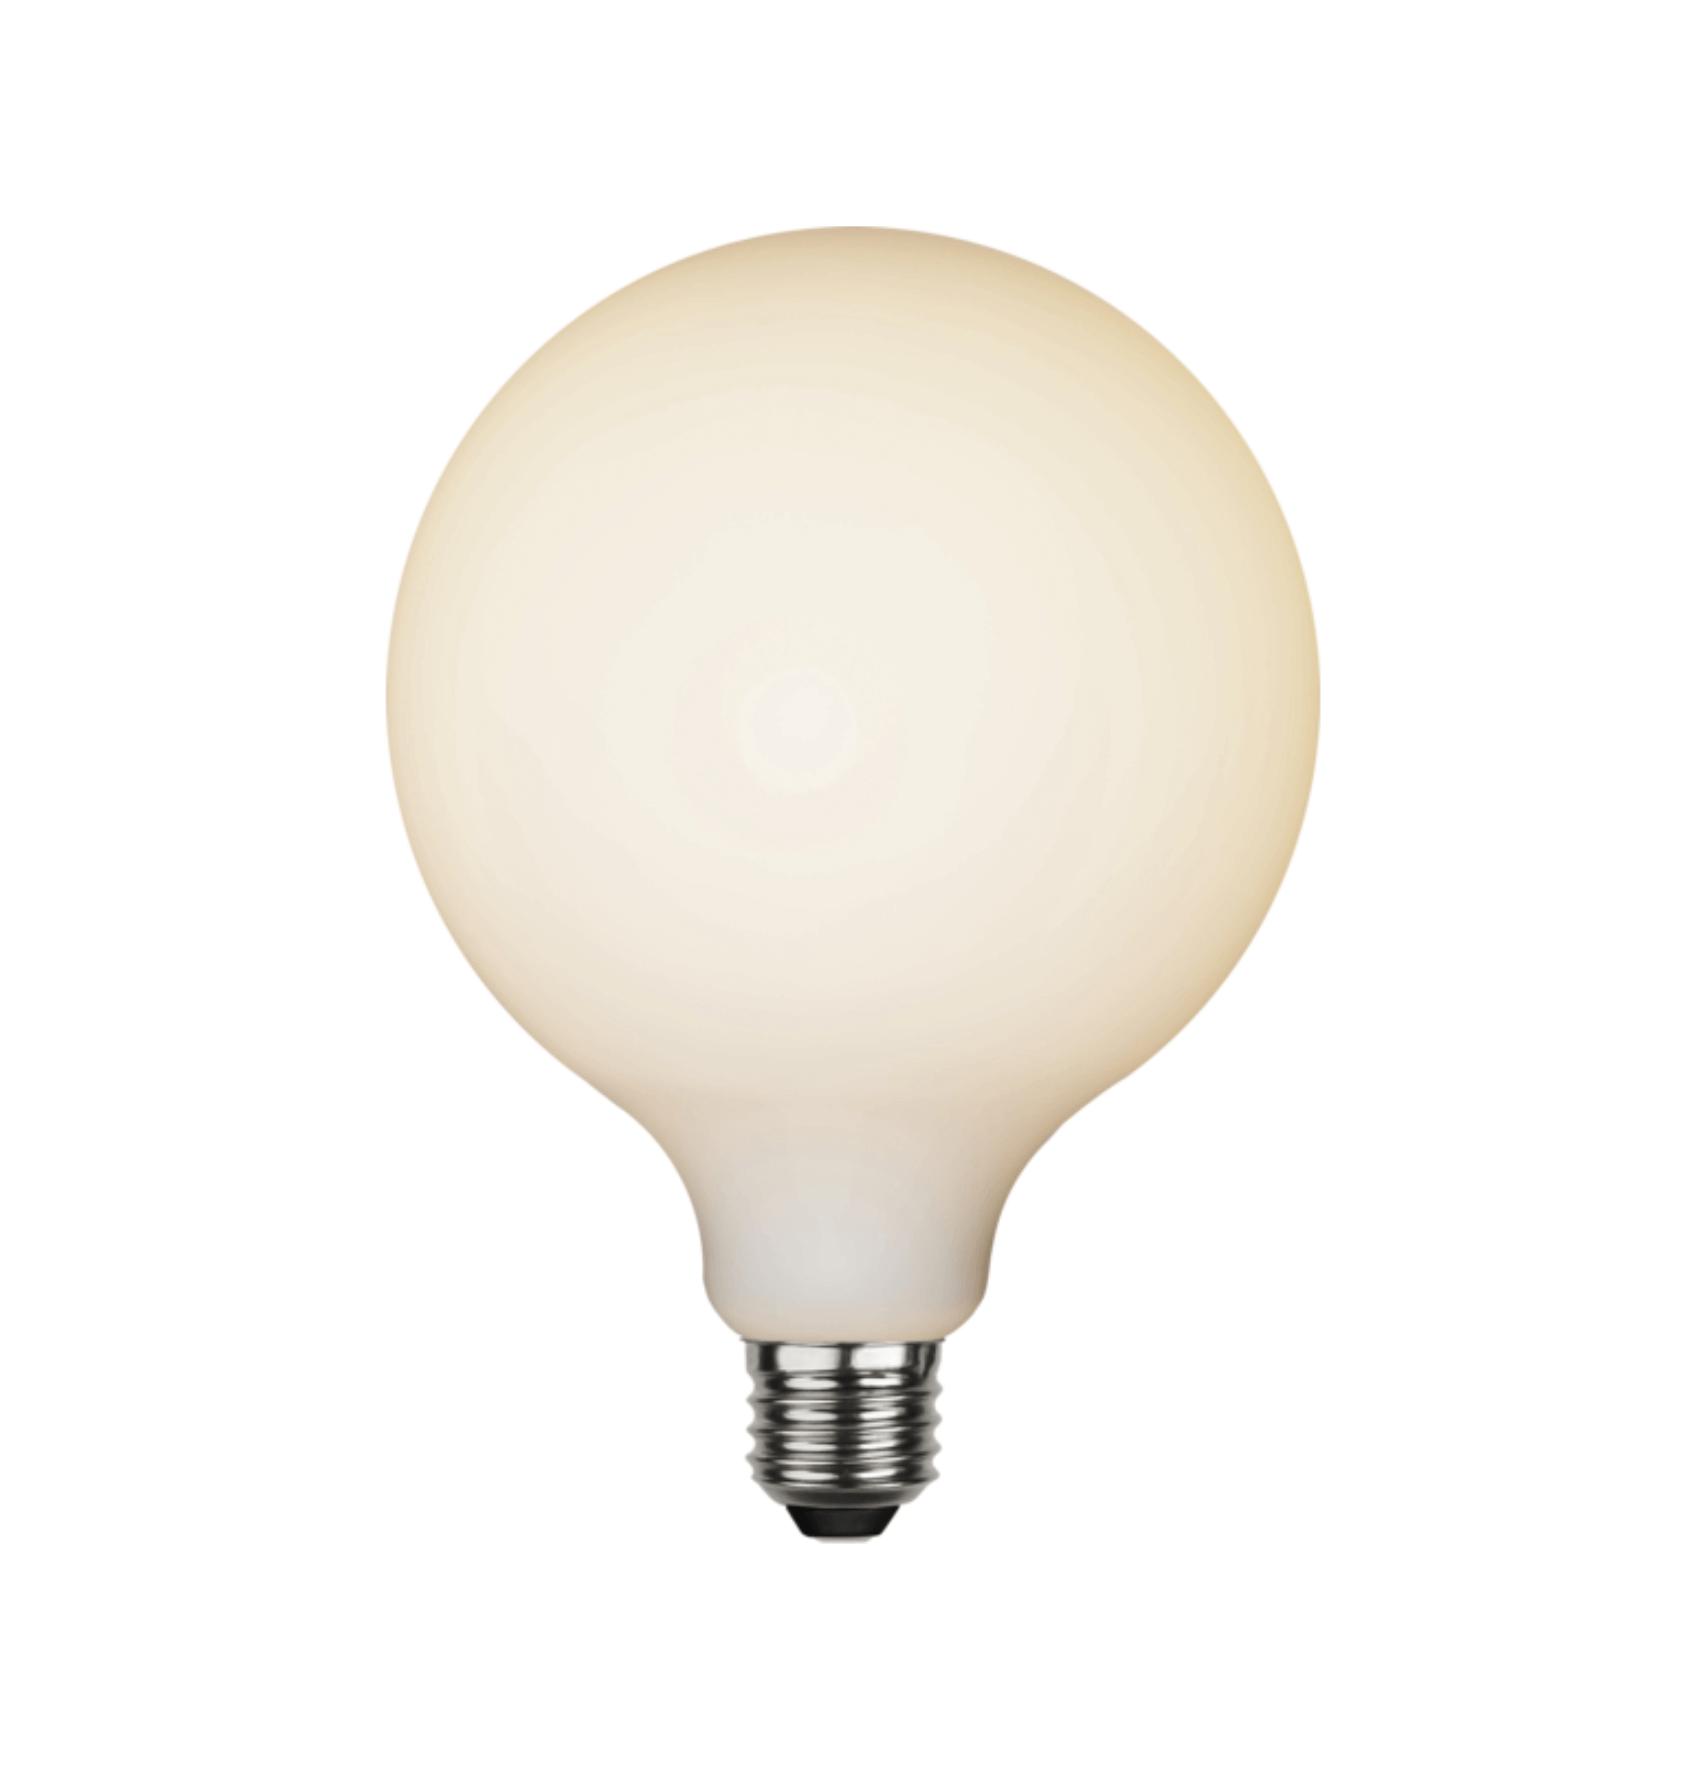 Ampoule LED rétro Globe en verre opalin